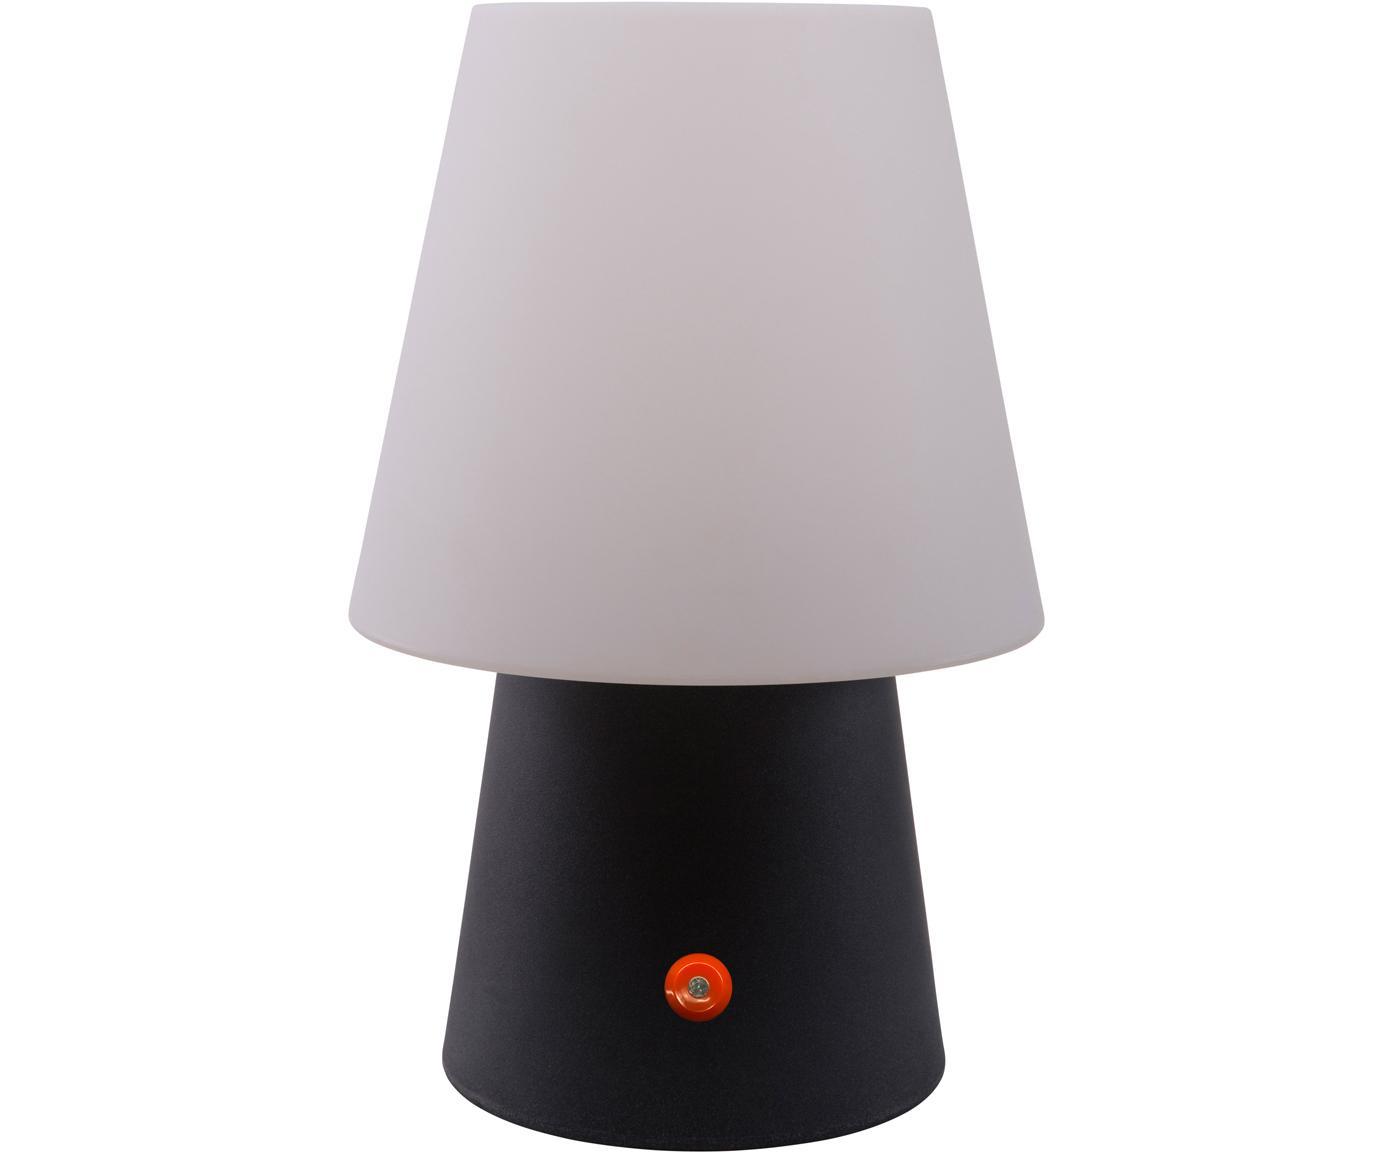 Lámpara de mesa LED móvil para exteriores No.1, Plástico (polietileno), Blanco, gris antracita, Ø 18 x Al 29 cm